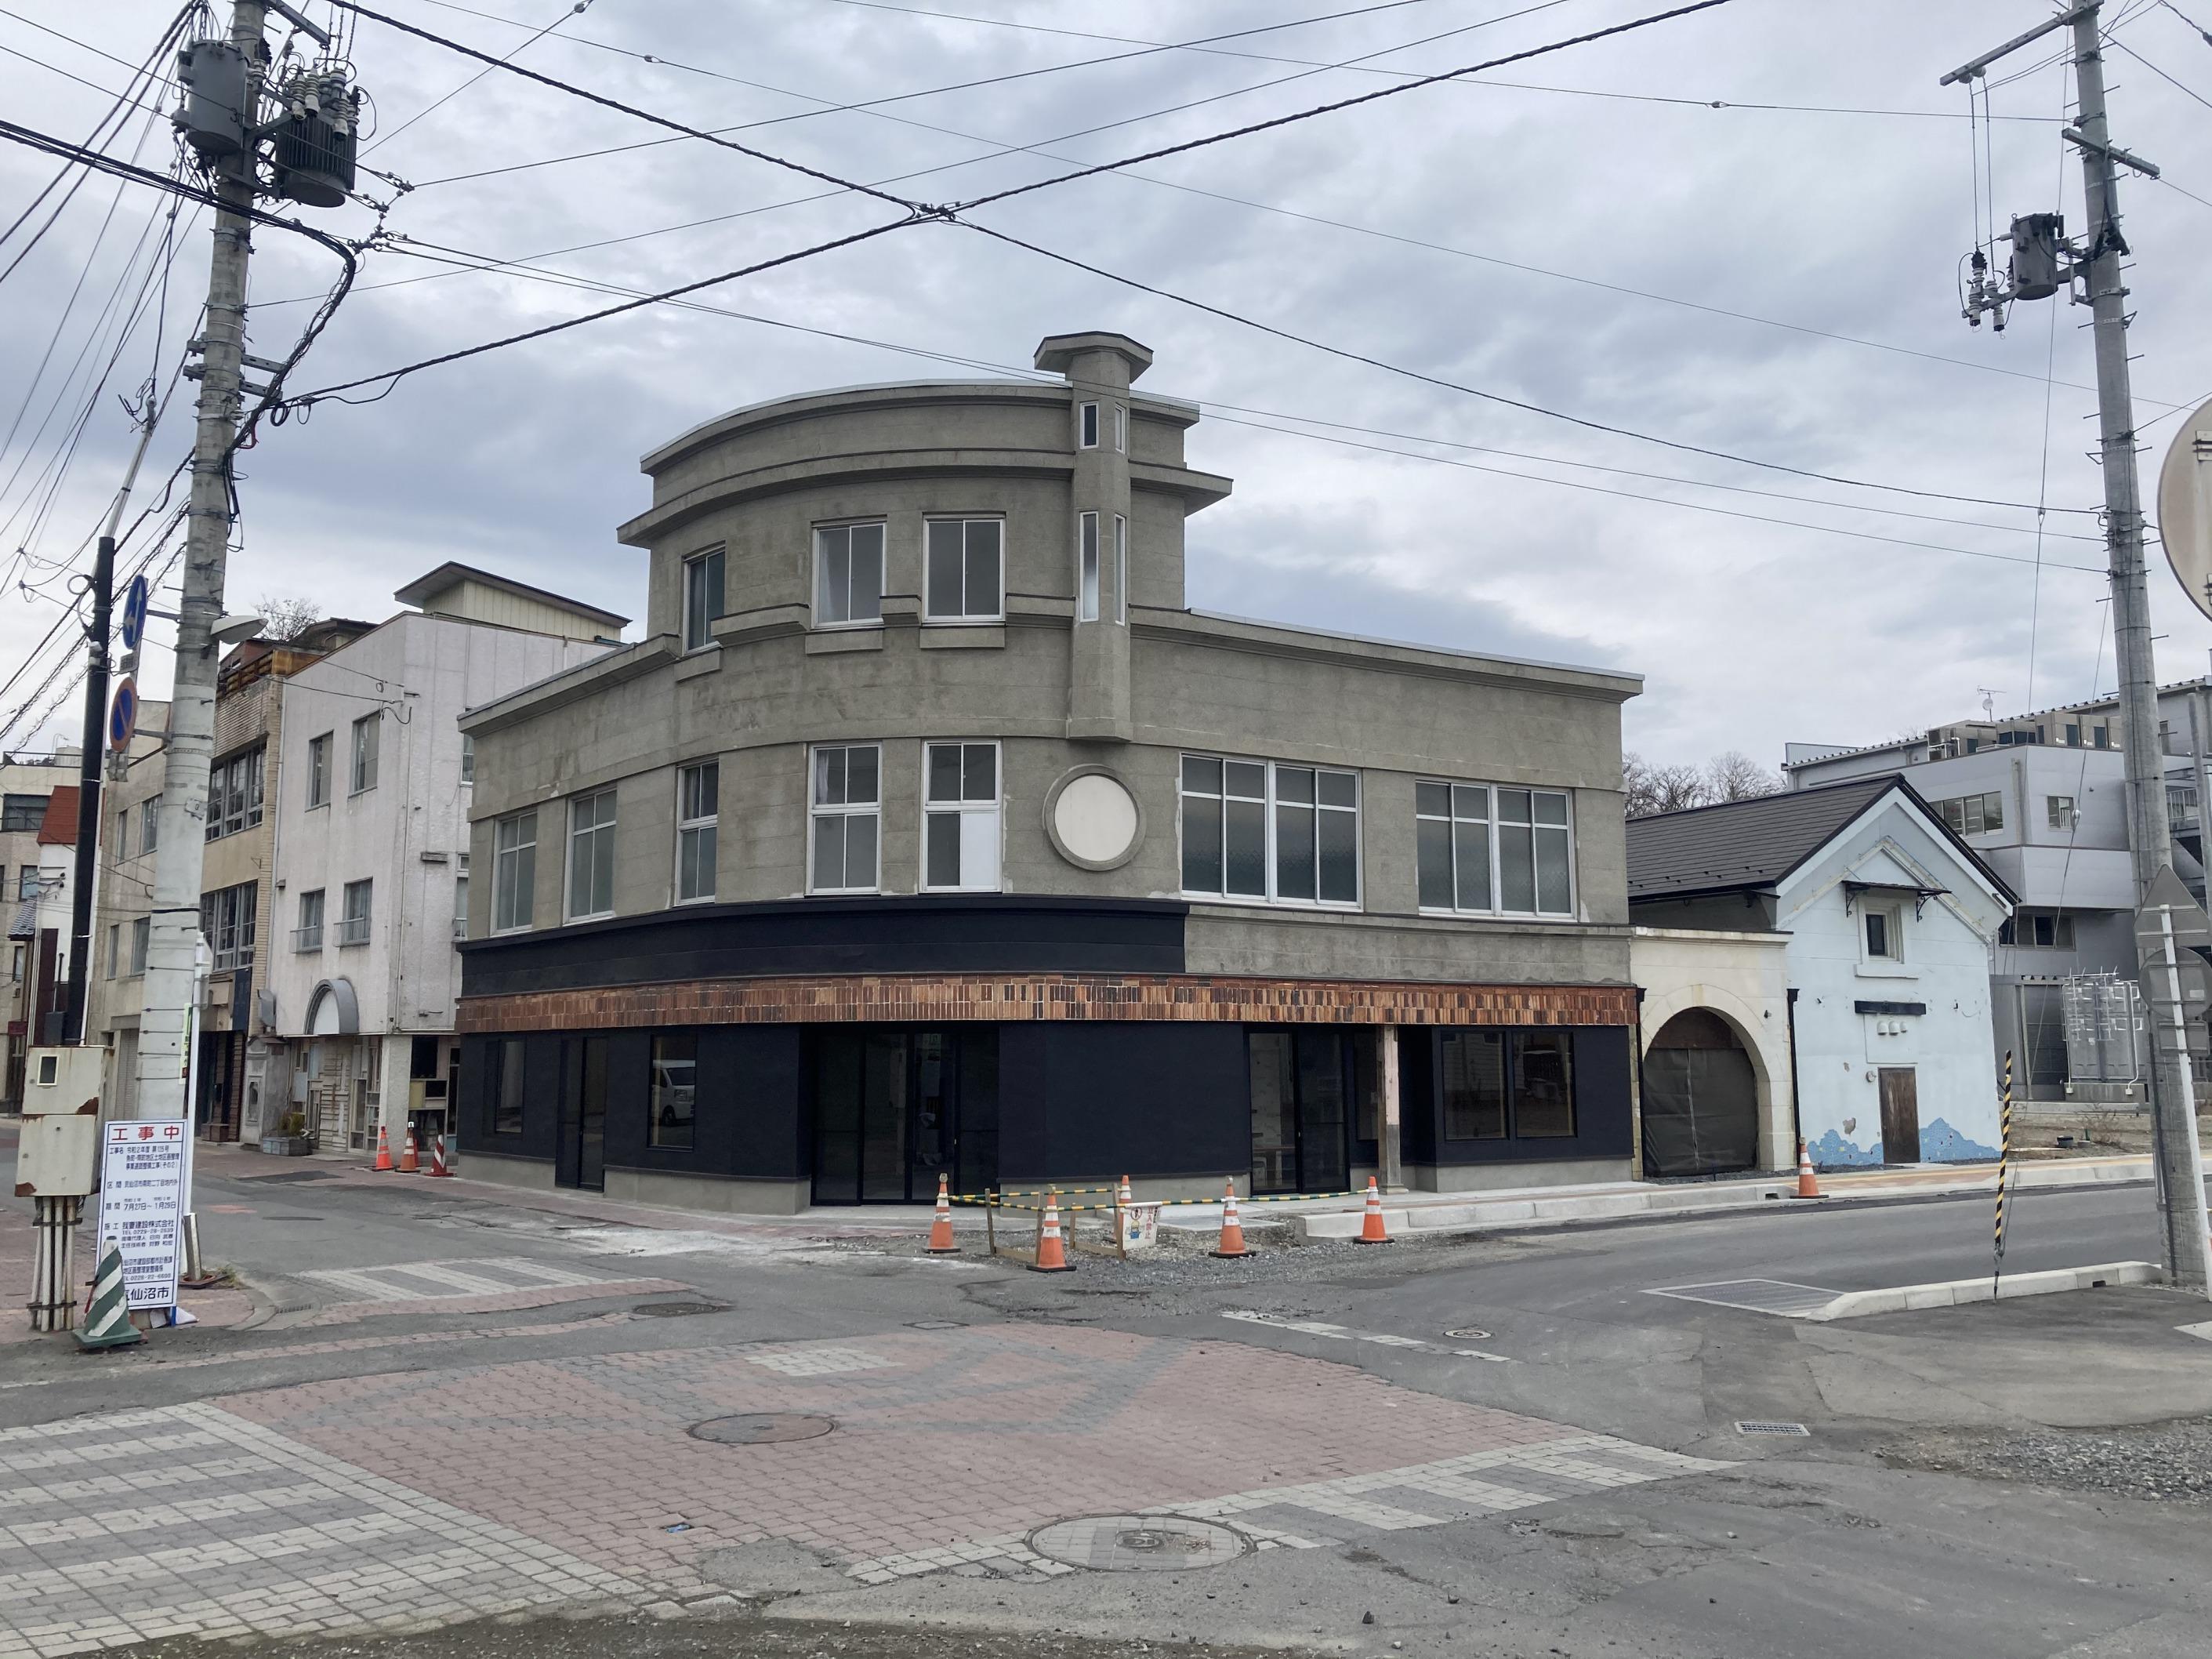 Facade of Chida House, Kesennuma, Japan